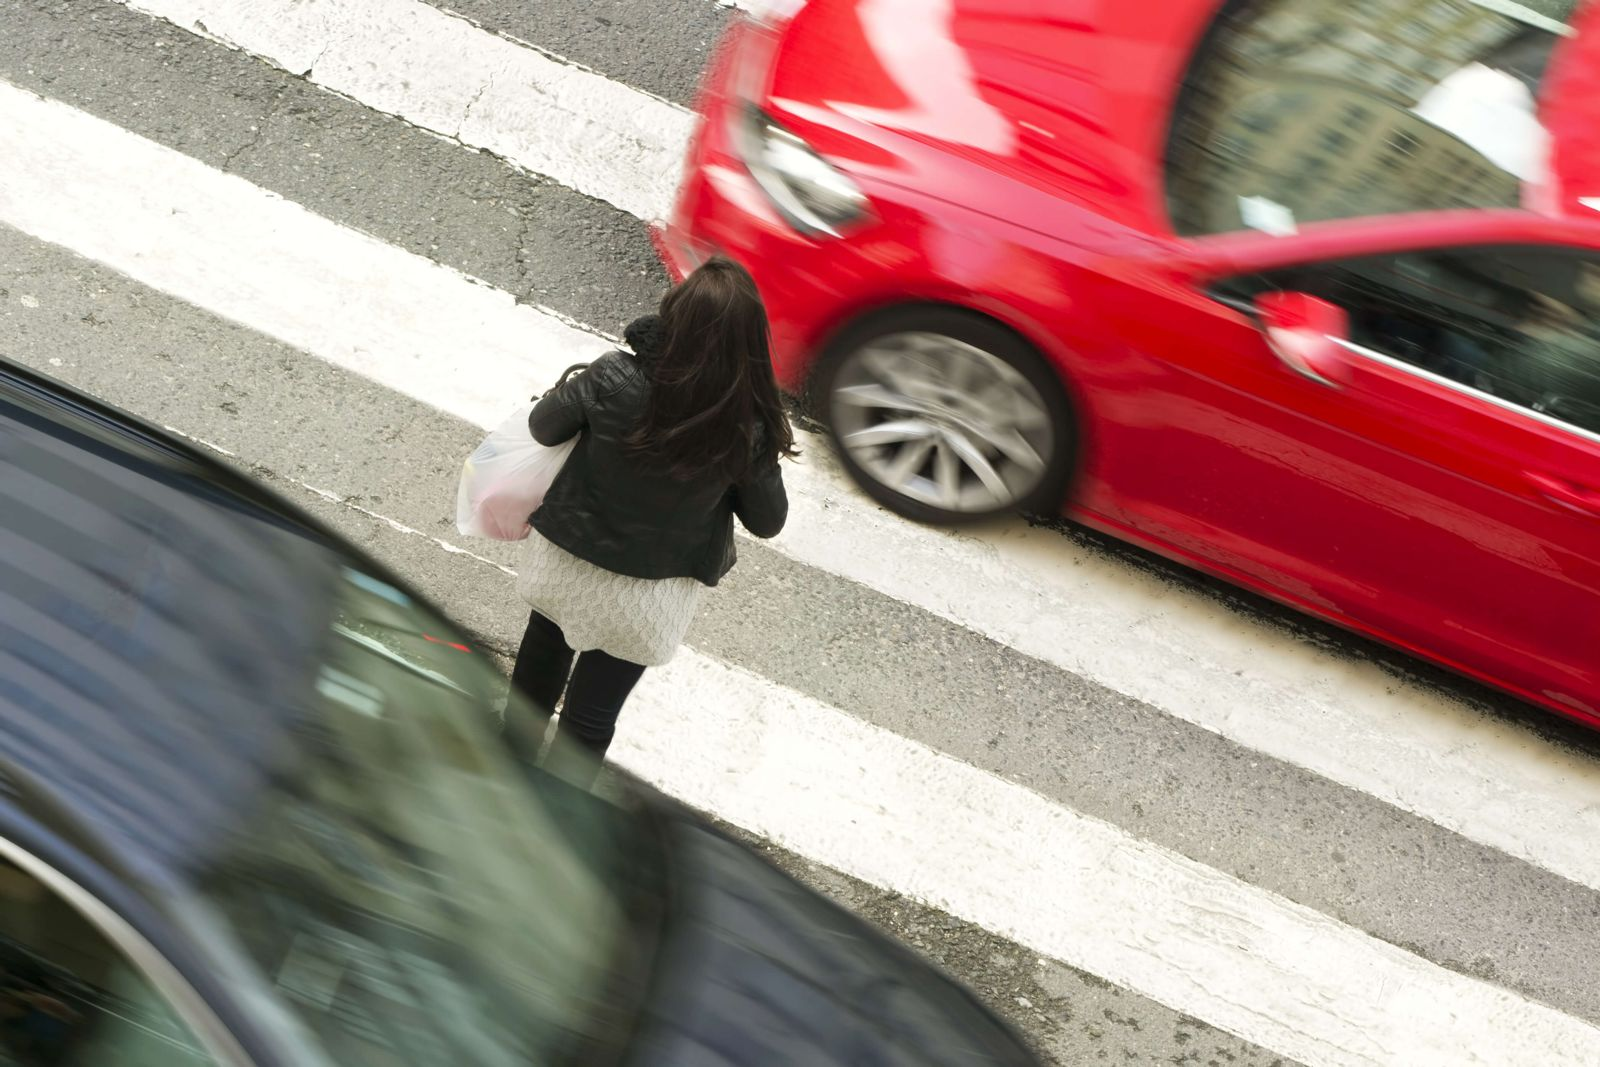 Louisiana Pedestrian Accident Lawyer Flattmann Law